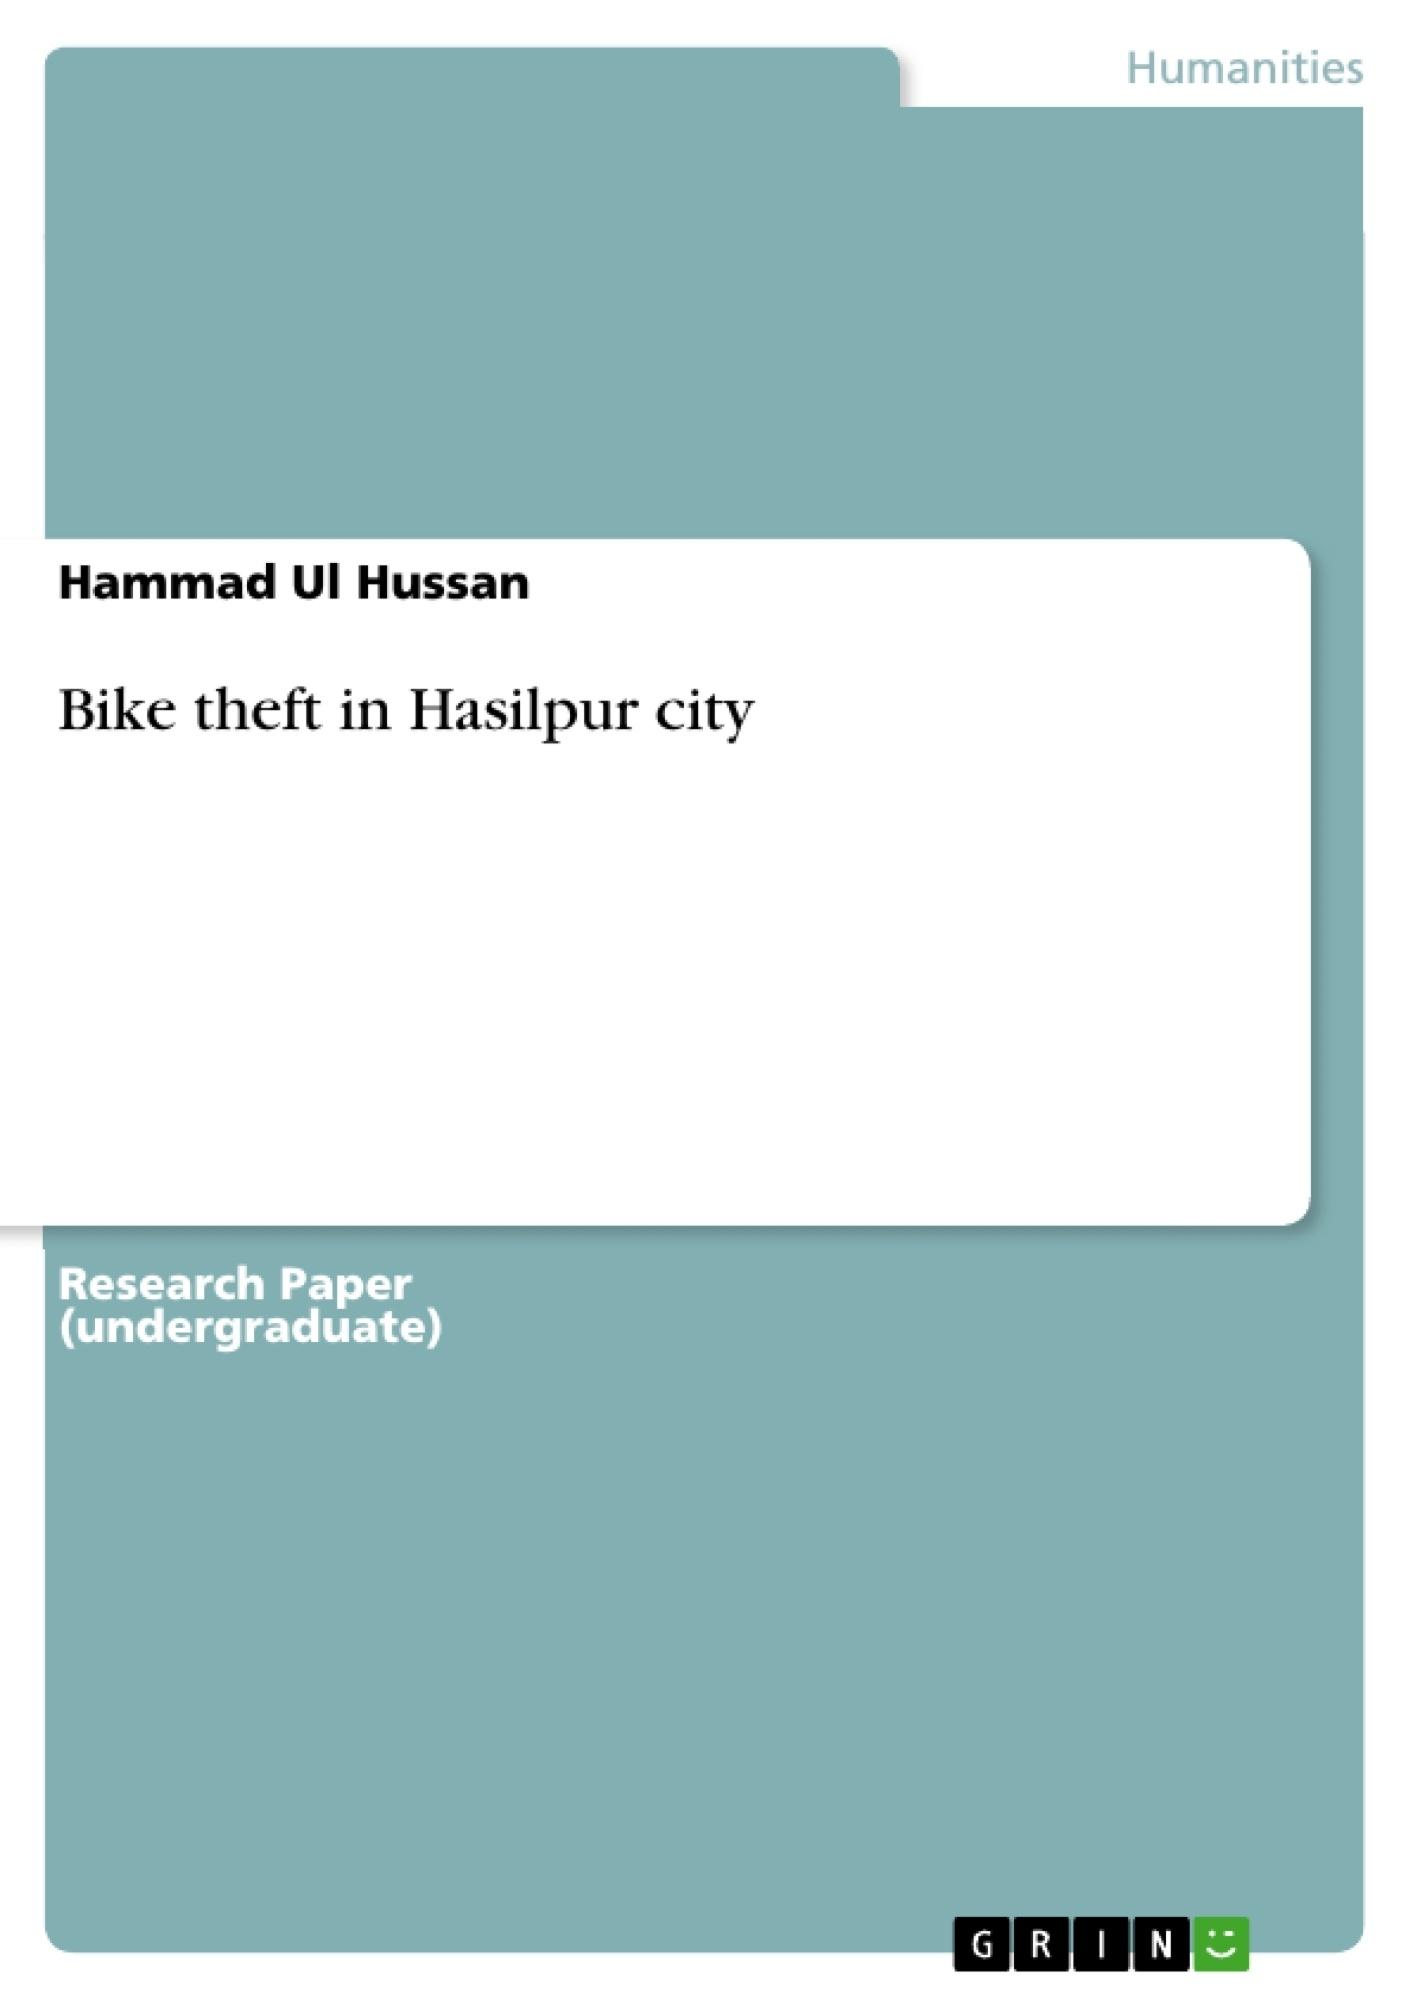 Title: Bike theft in Hasilpur city